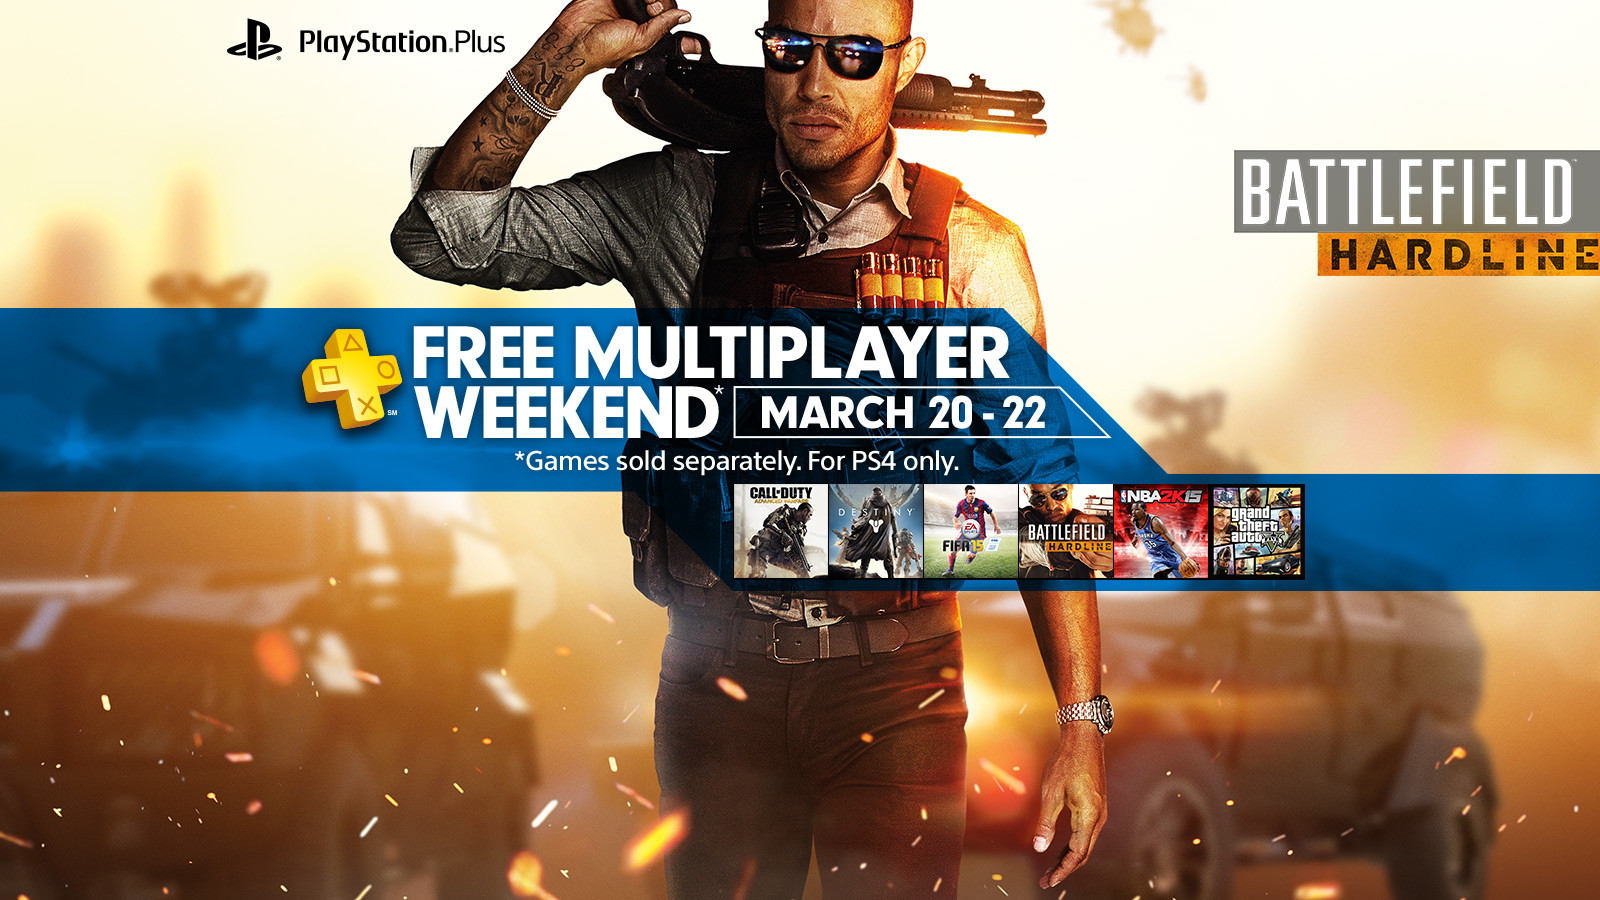 Zahrajte si o víkendu na PS4 multiplayer bez PS Plus 107069